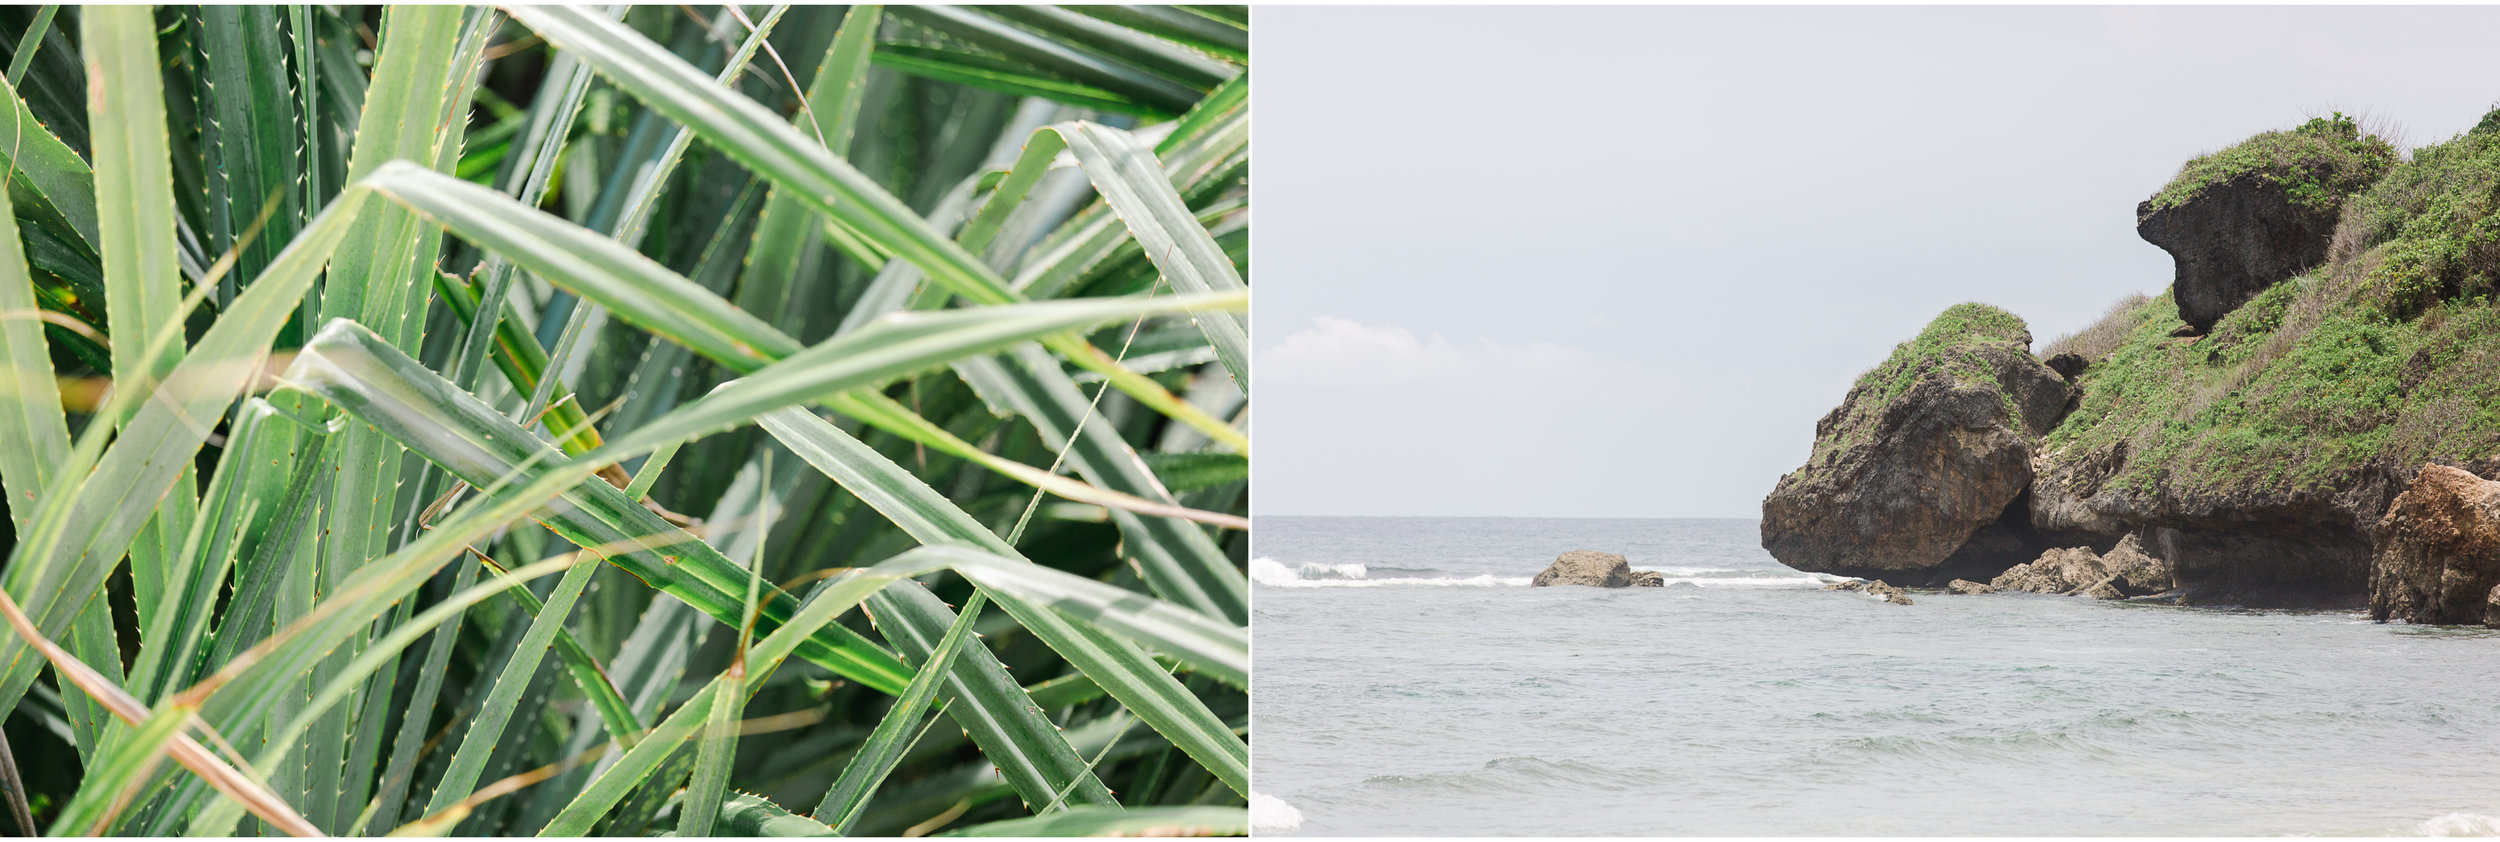 Maine Wedding Photographer Travels to Bali 5.jpg